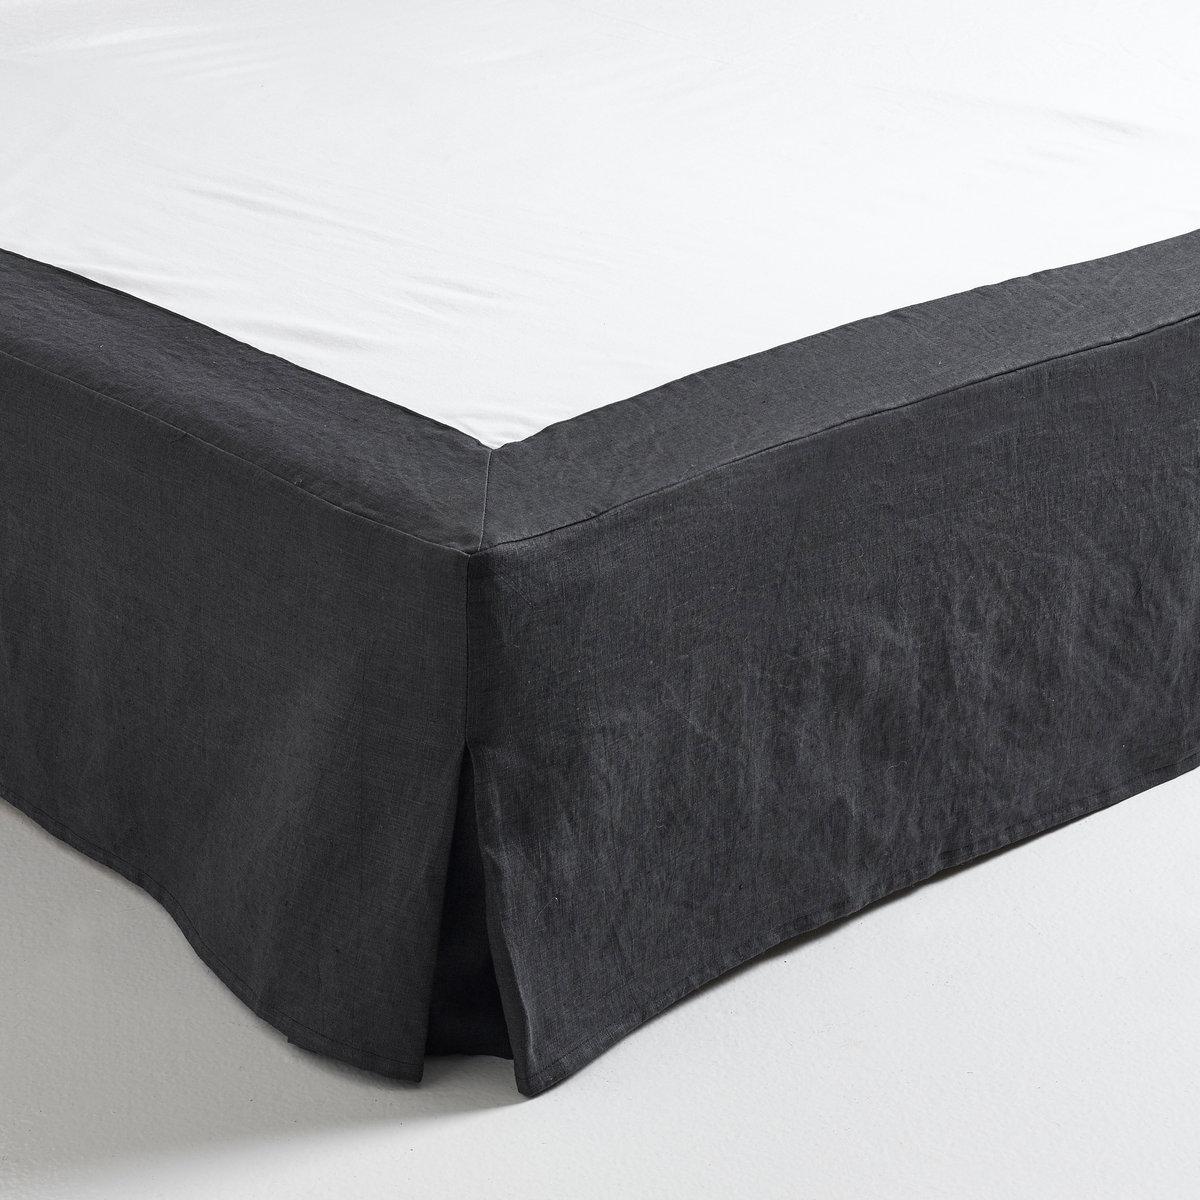 Чехол LaRedoute Для кровати из пенькихлопка Lino 90 x 190 см серый кровати 160 см